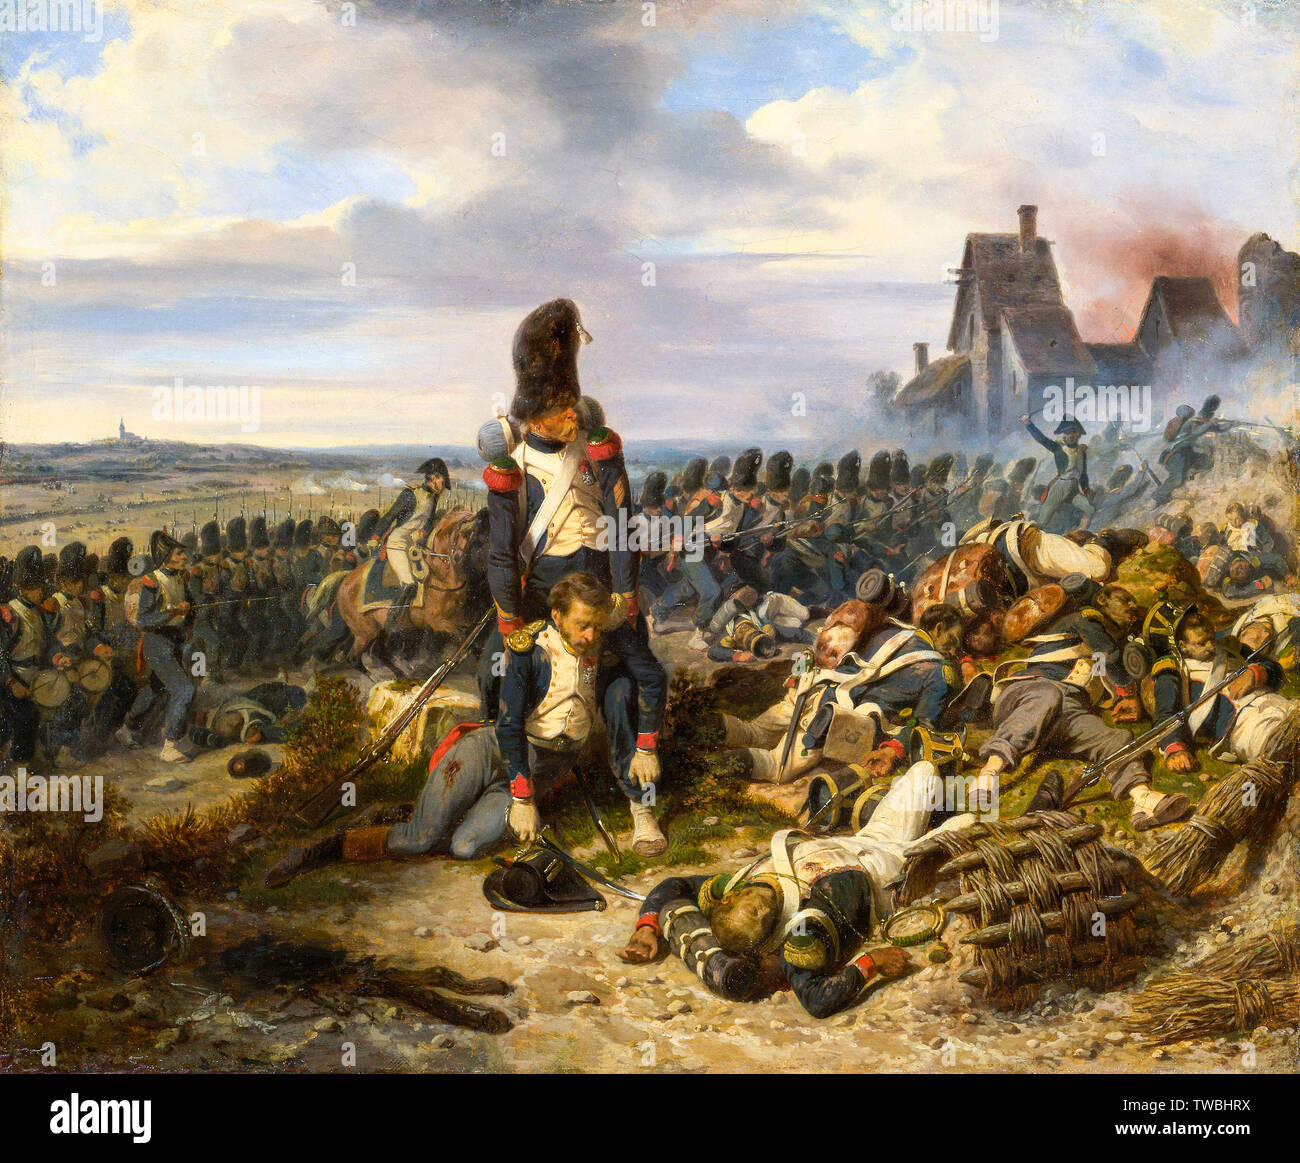 Battle Scene, Battle of Waterloo by Hippolyte Bellange, painting, circa 1825 - Stock Image